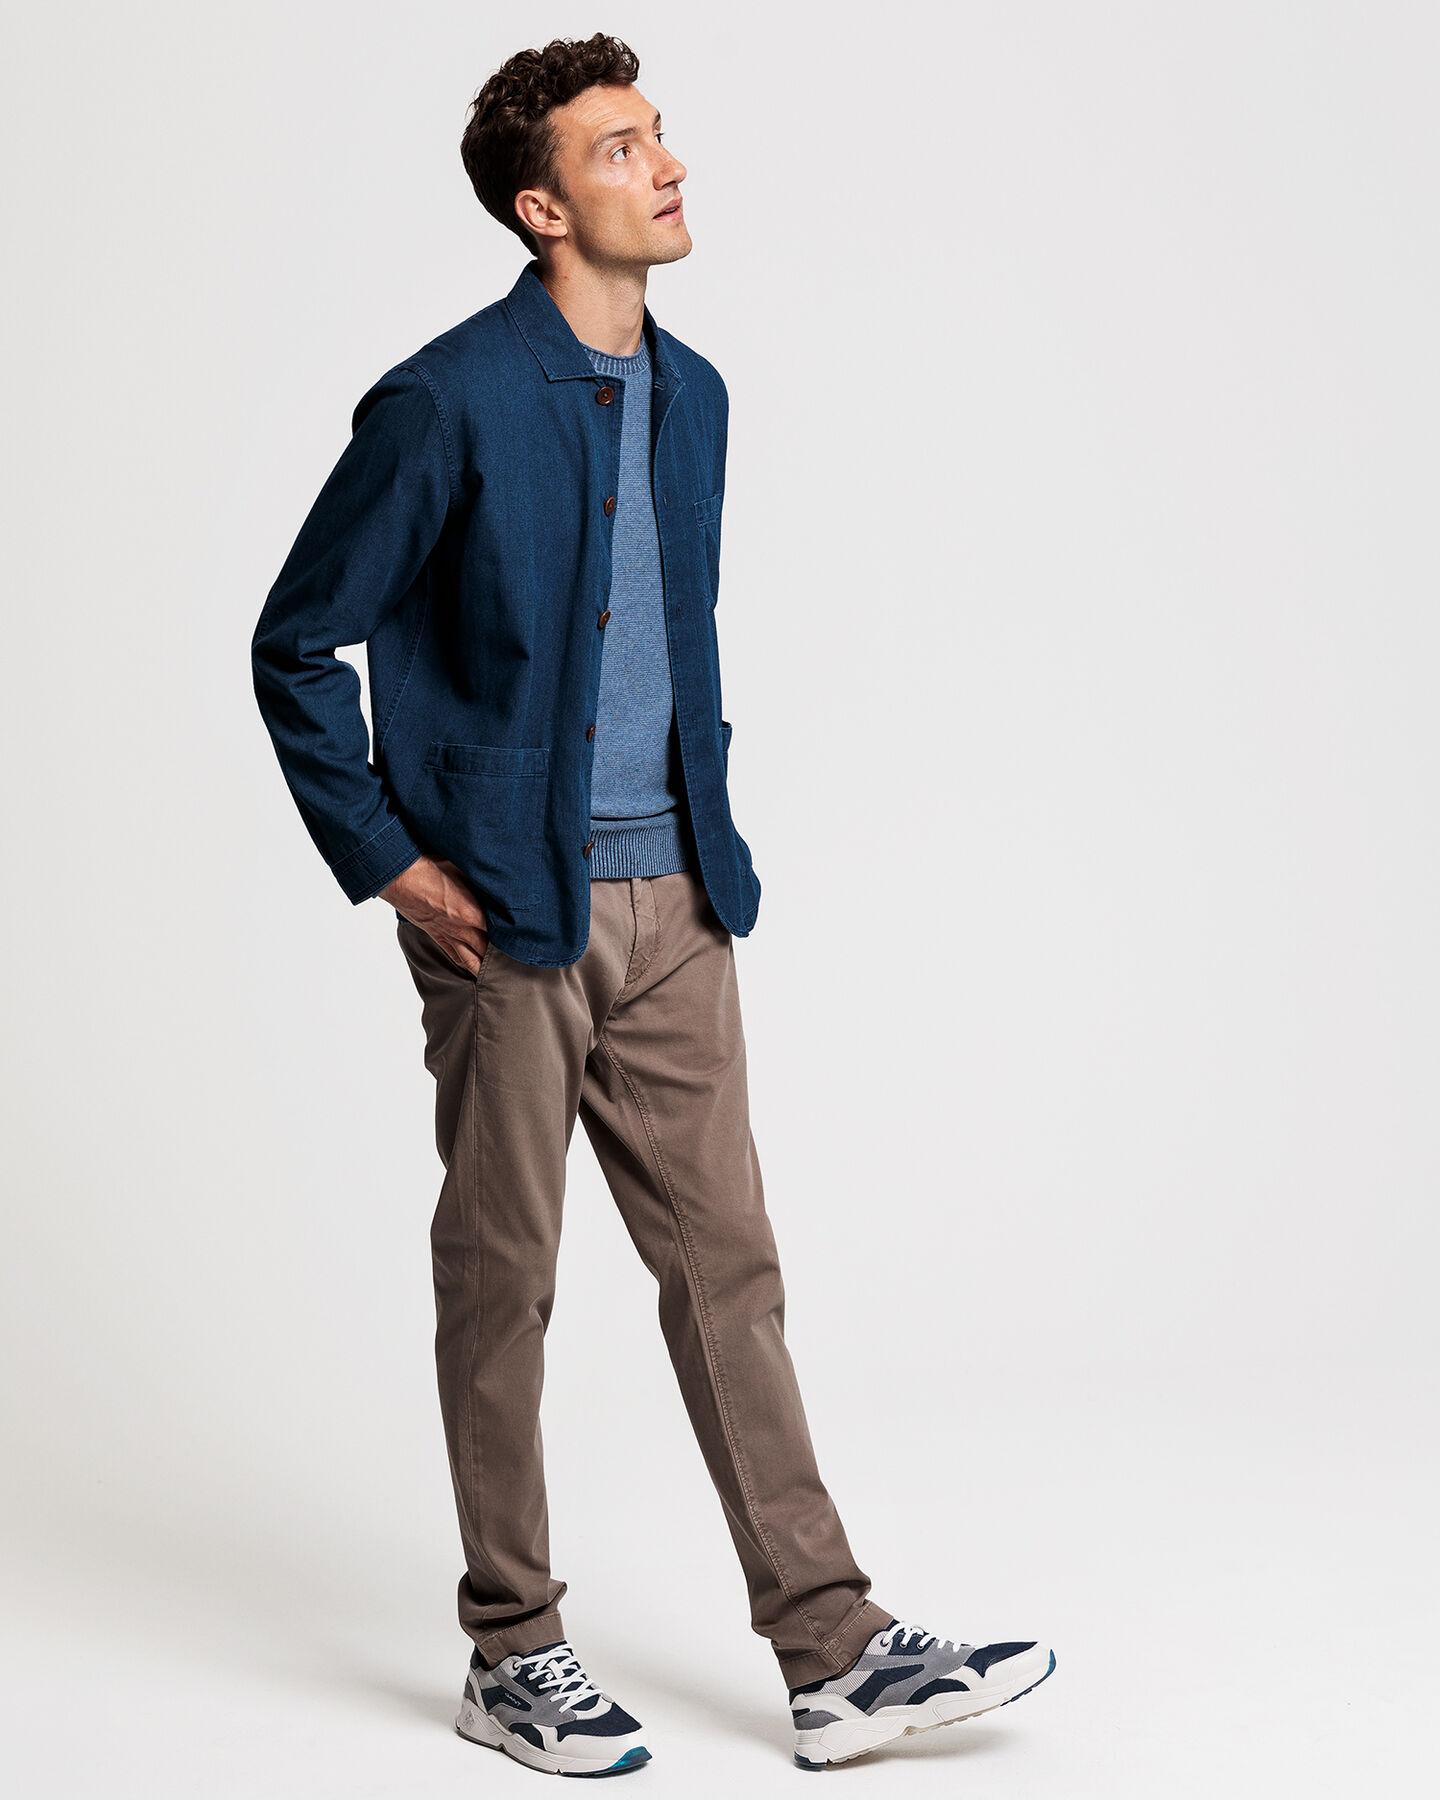 Indigoblaue Royal Oxford-Hemdjacke